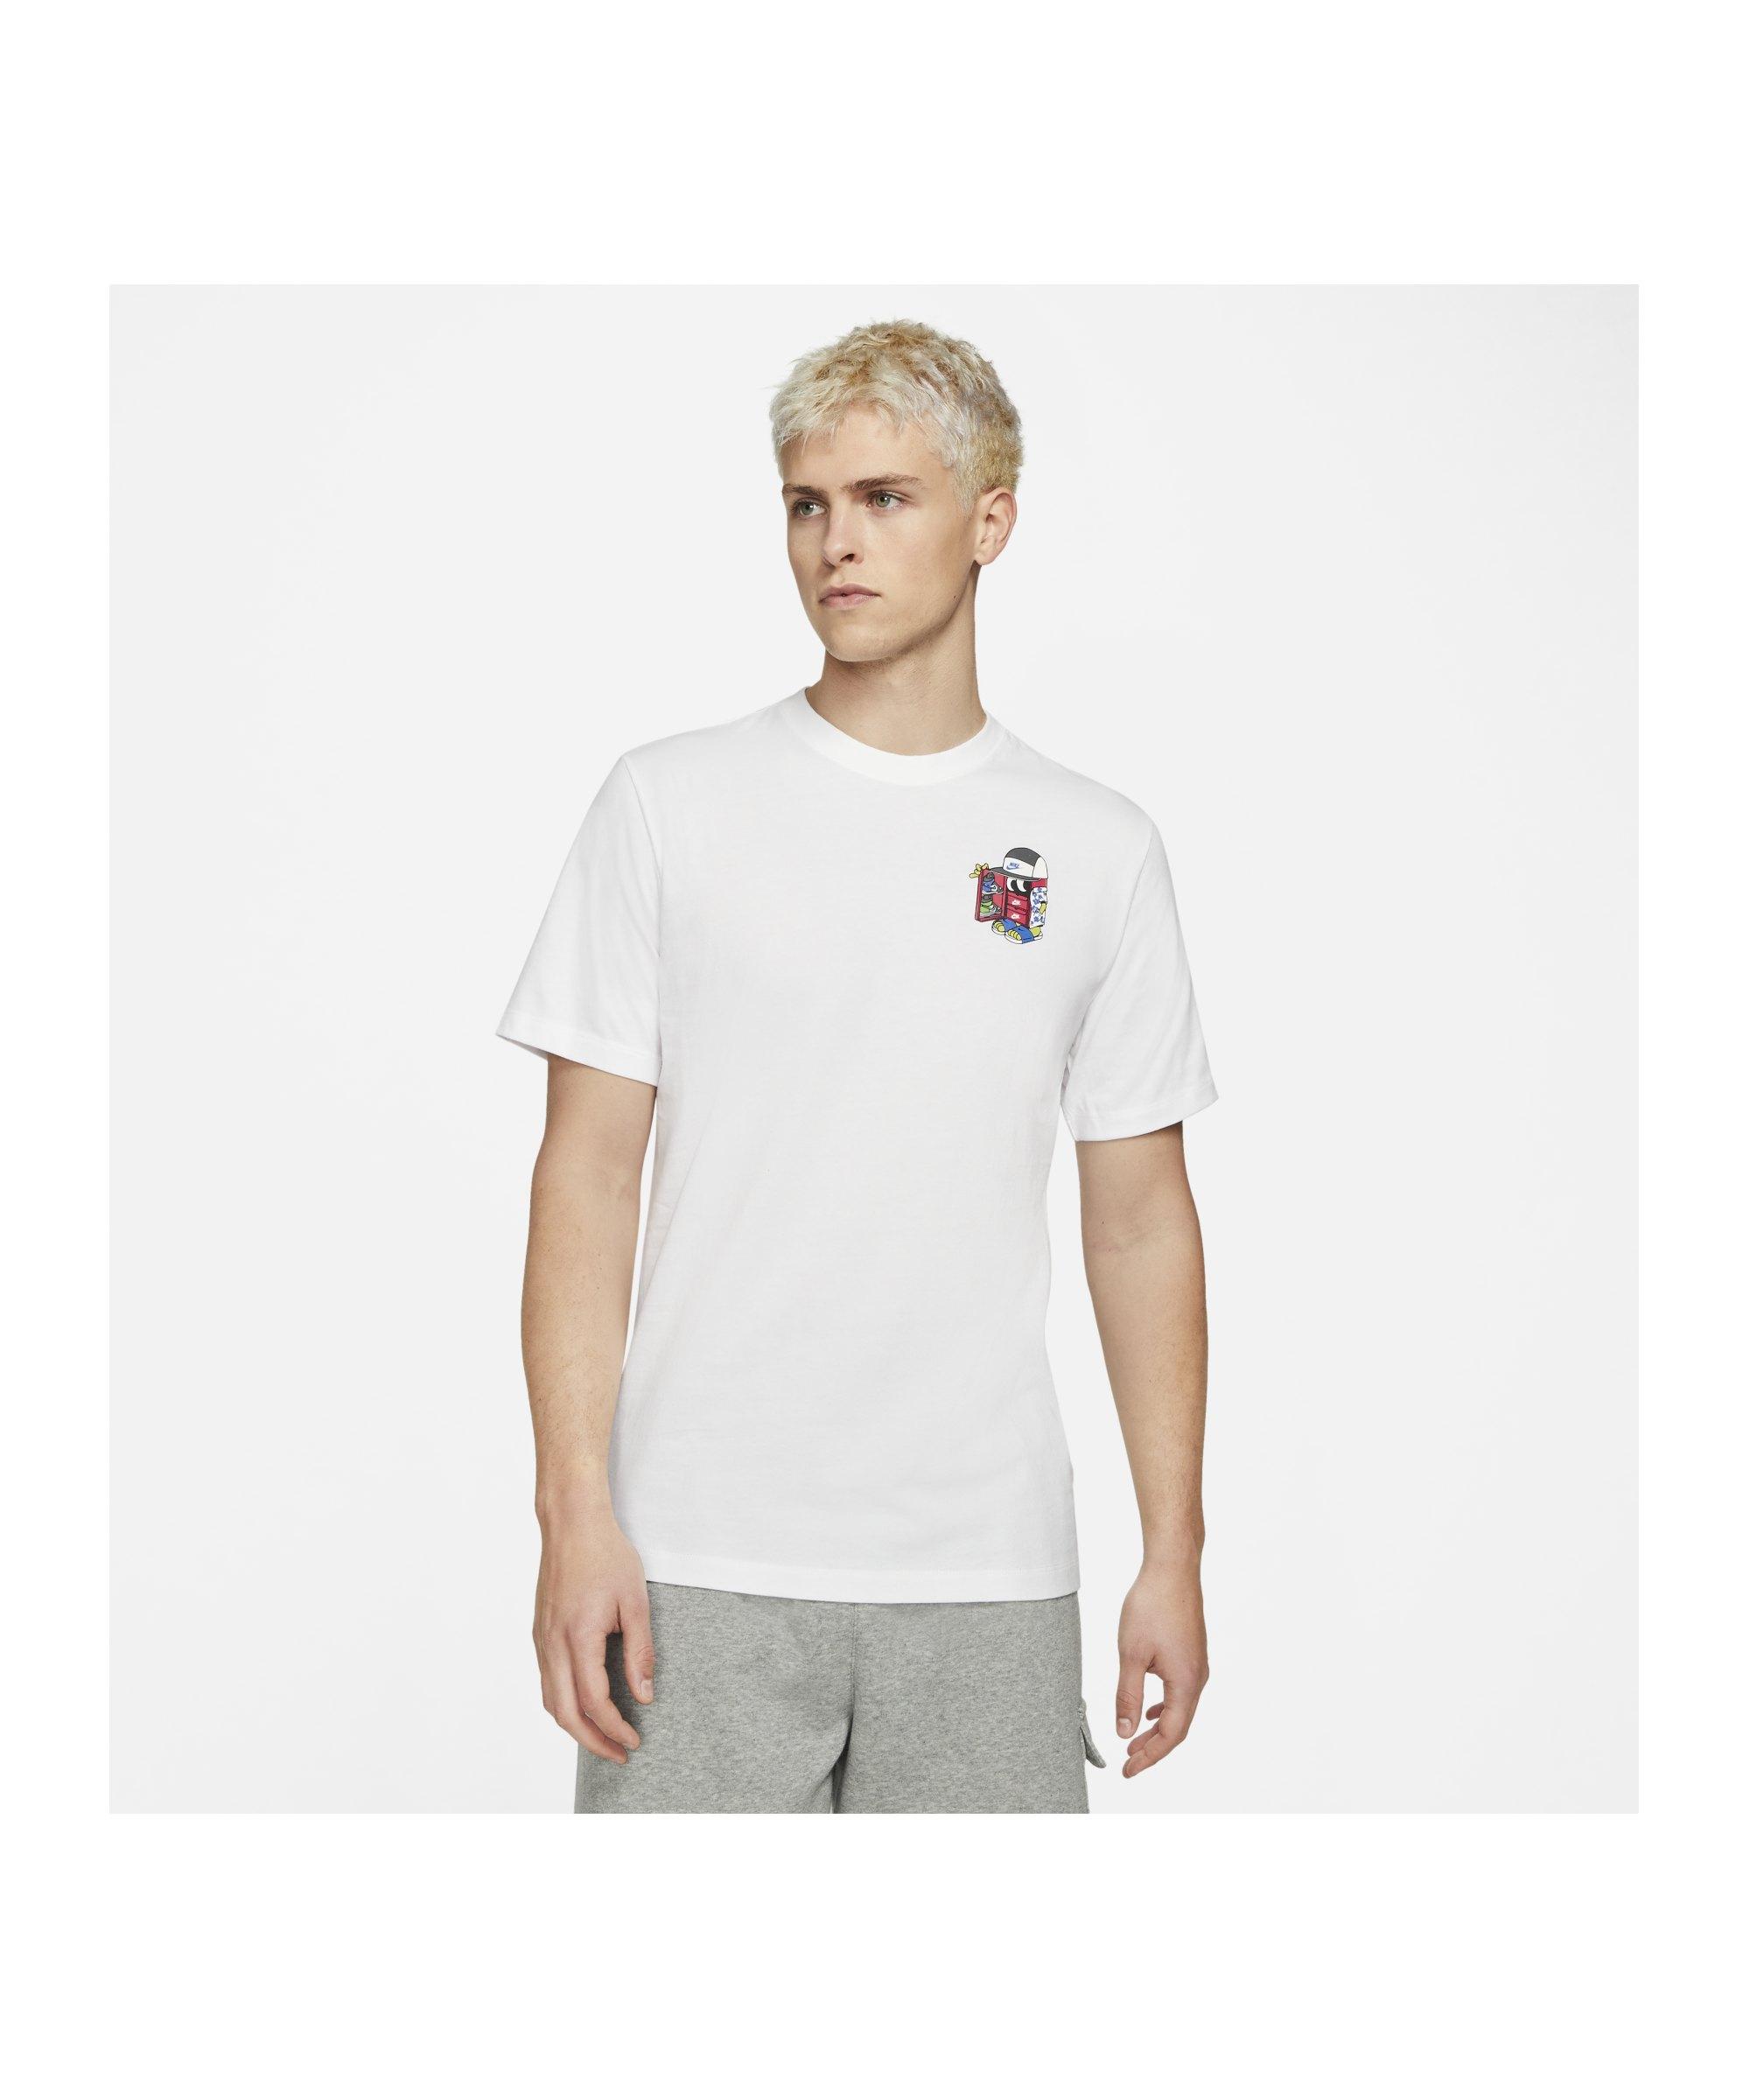 Nike Shoebox T-Shirt Weiss F100 - weiss